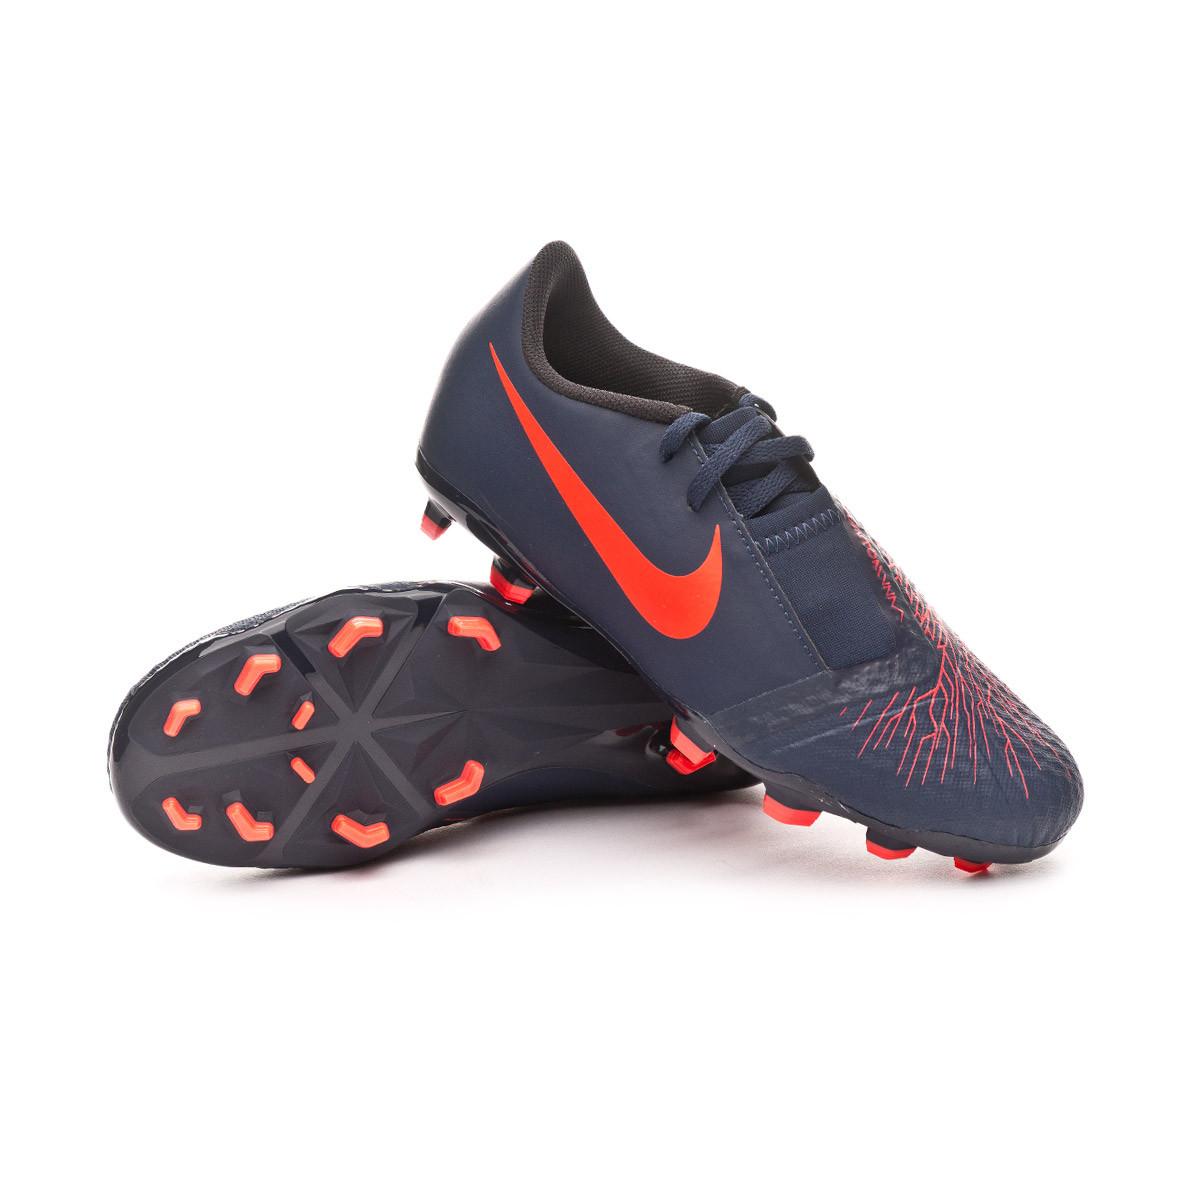 872d544fd Football Boots Nike Kids Phantom Venom Academy FG Obsidian-White ...